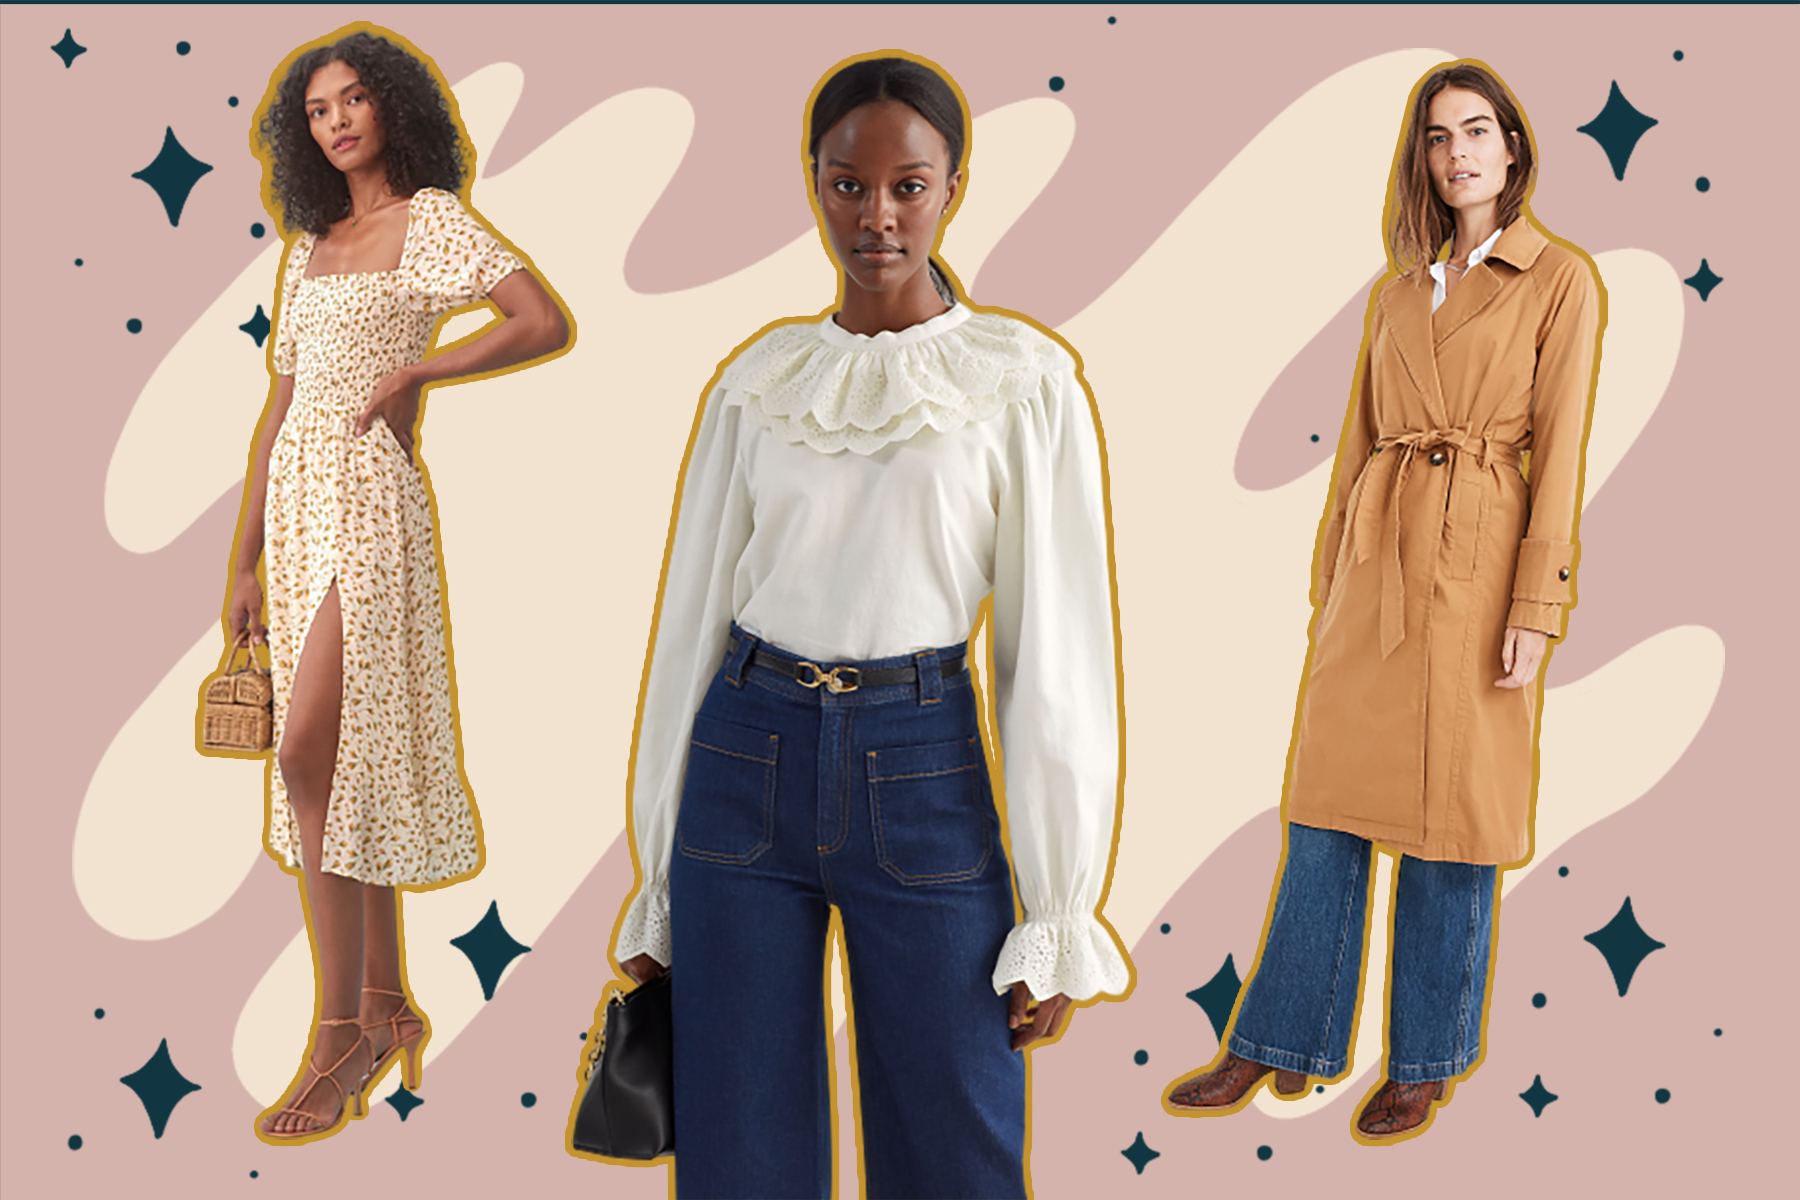 vintage trend zodiac sign fashion shopping